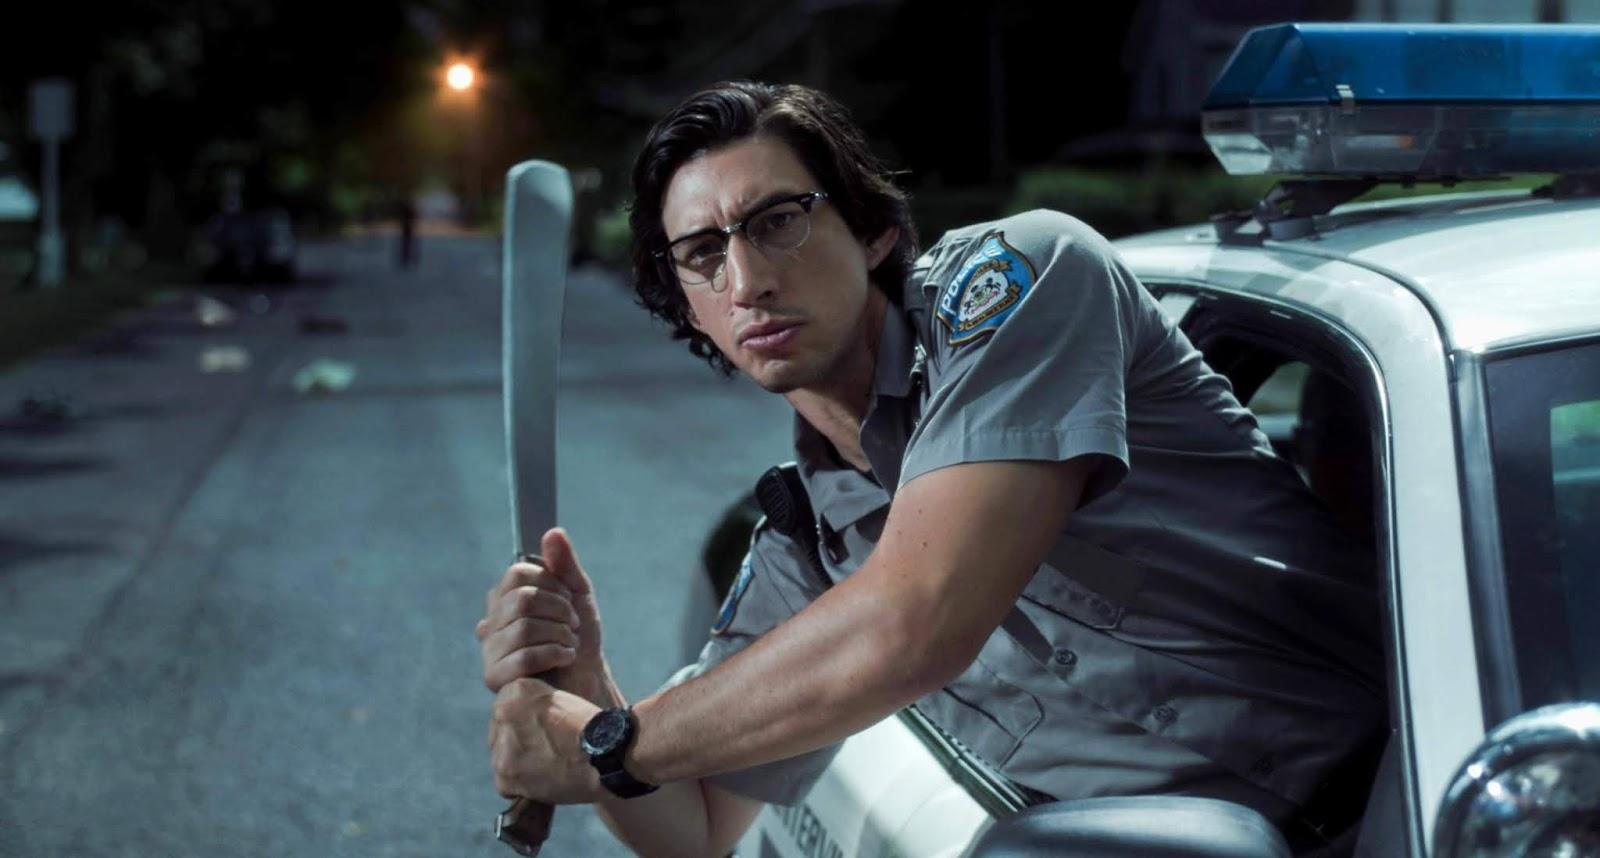 zombie,trailer,parody,swinton,driver,cops,dead man,adam,ghost,sara